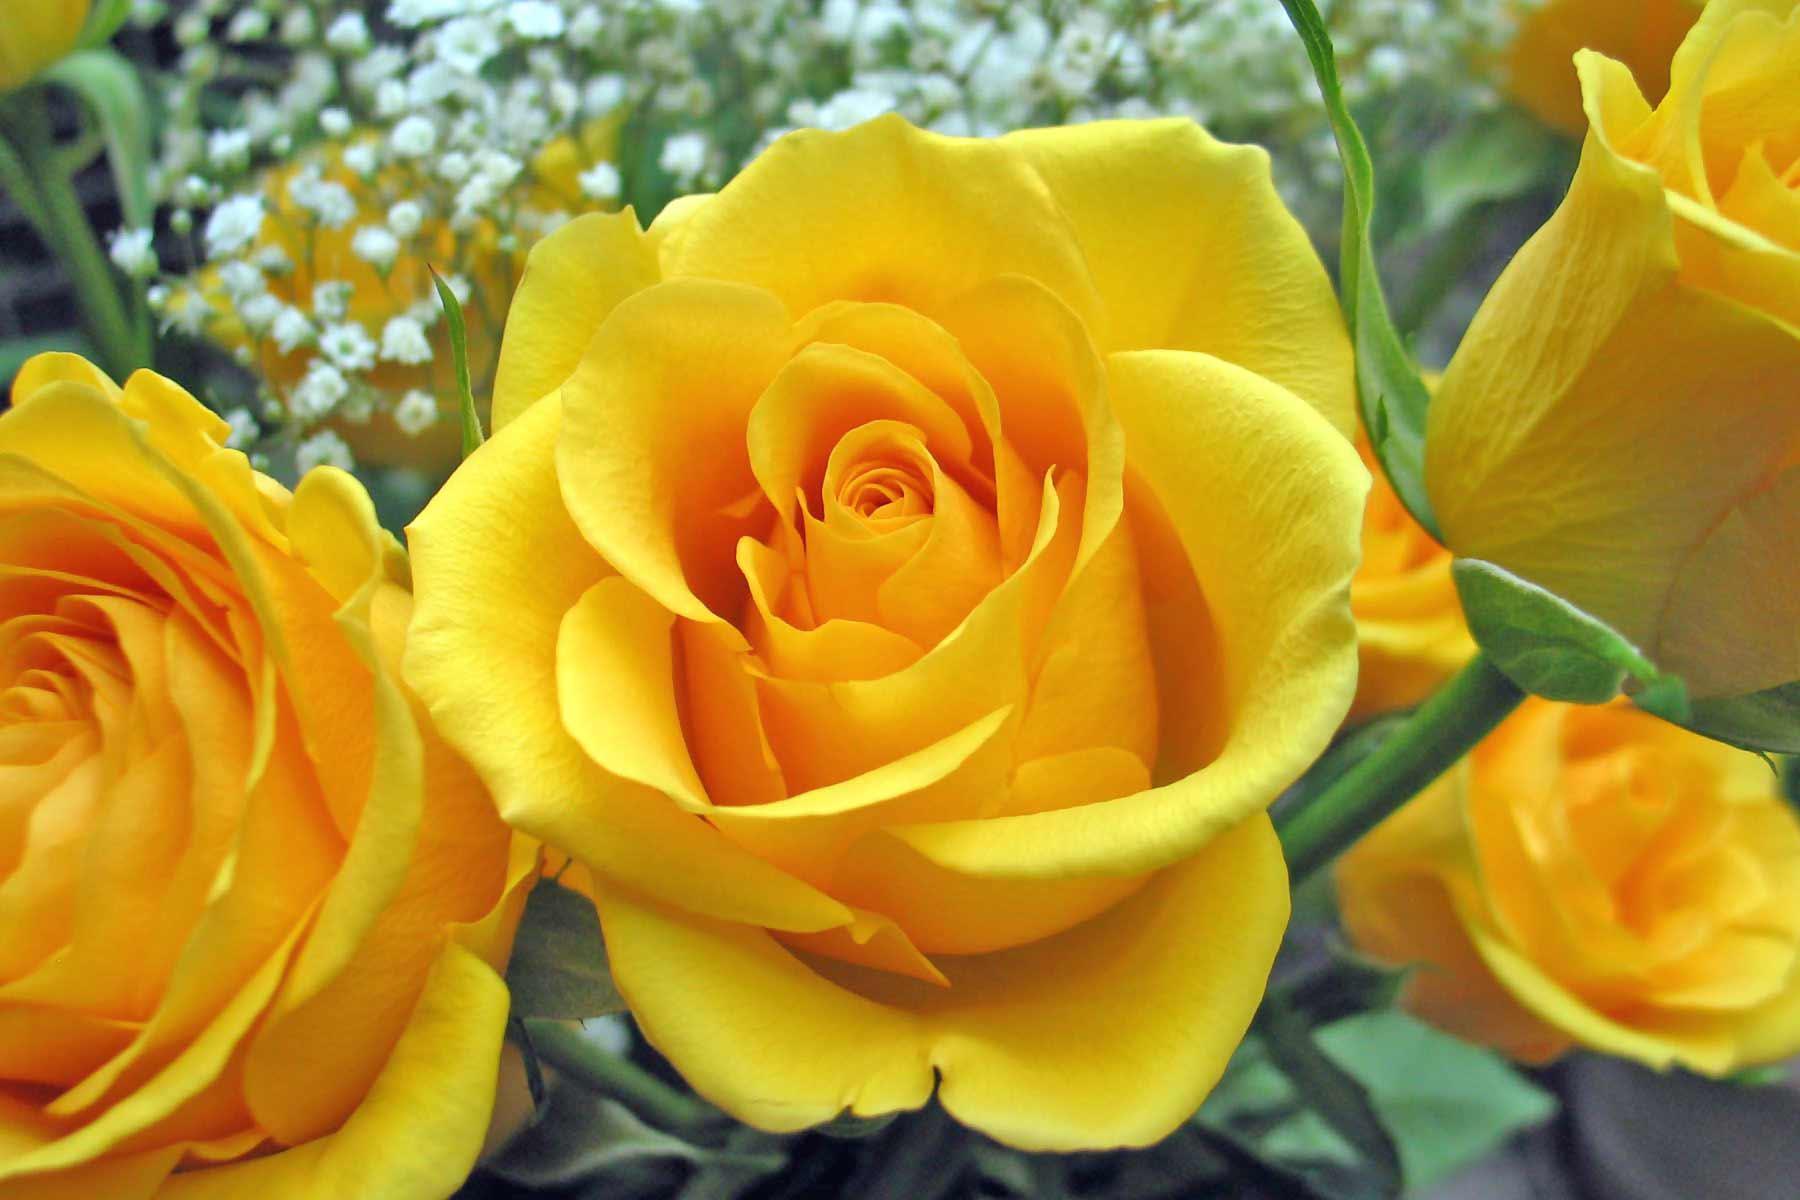 Hd wallpaper yellow rose - Flowers For Yellow Rose Flower Wallpaper